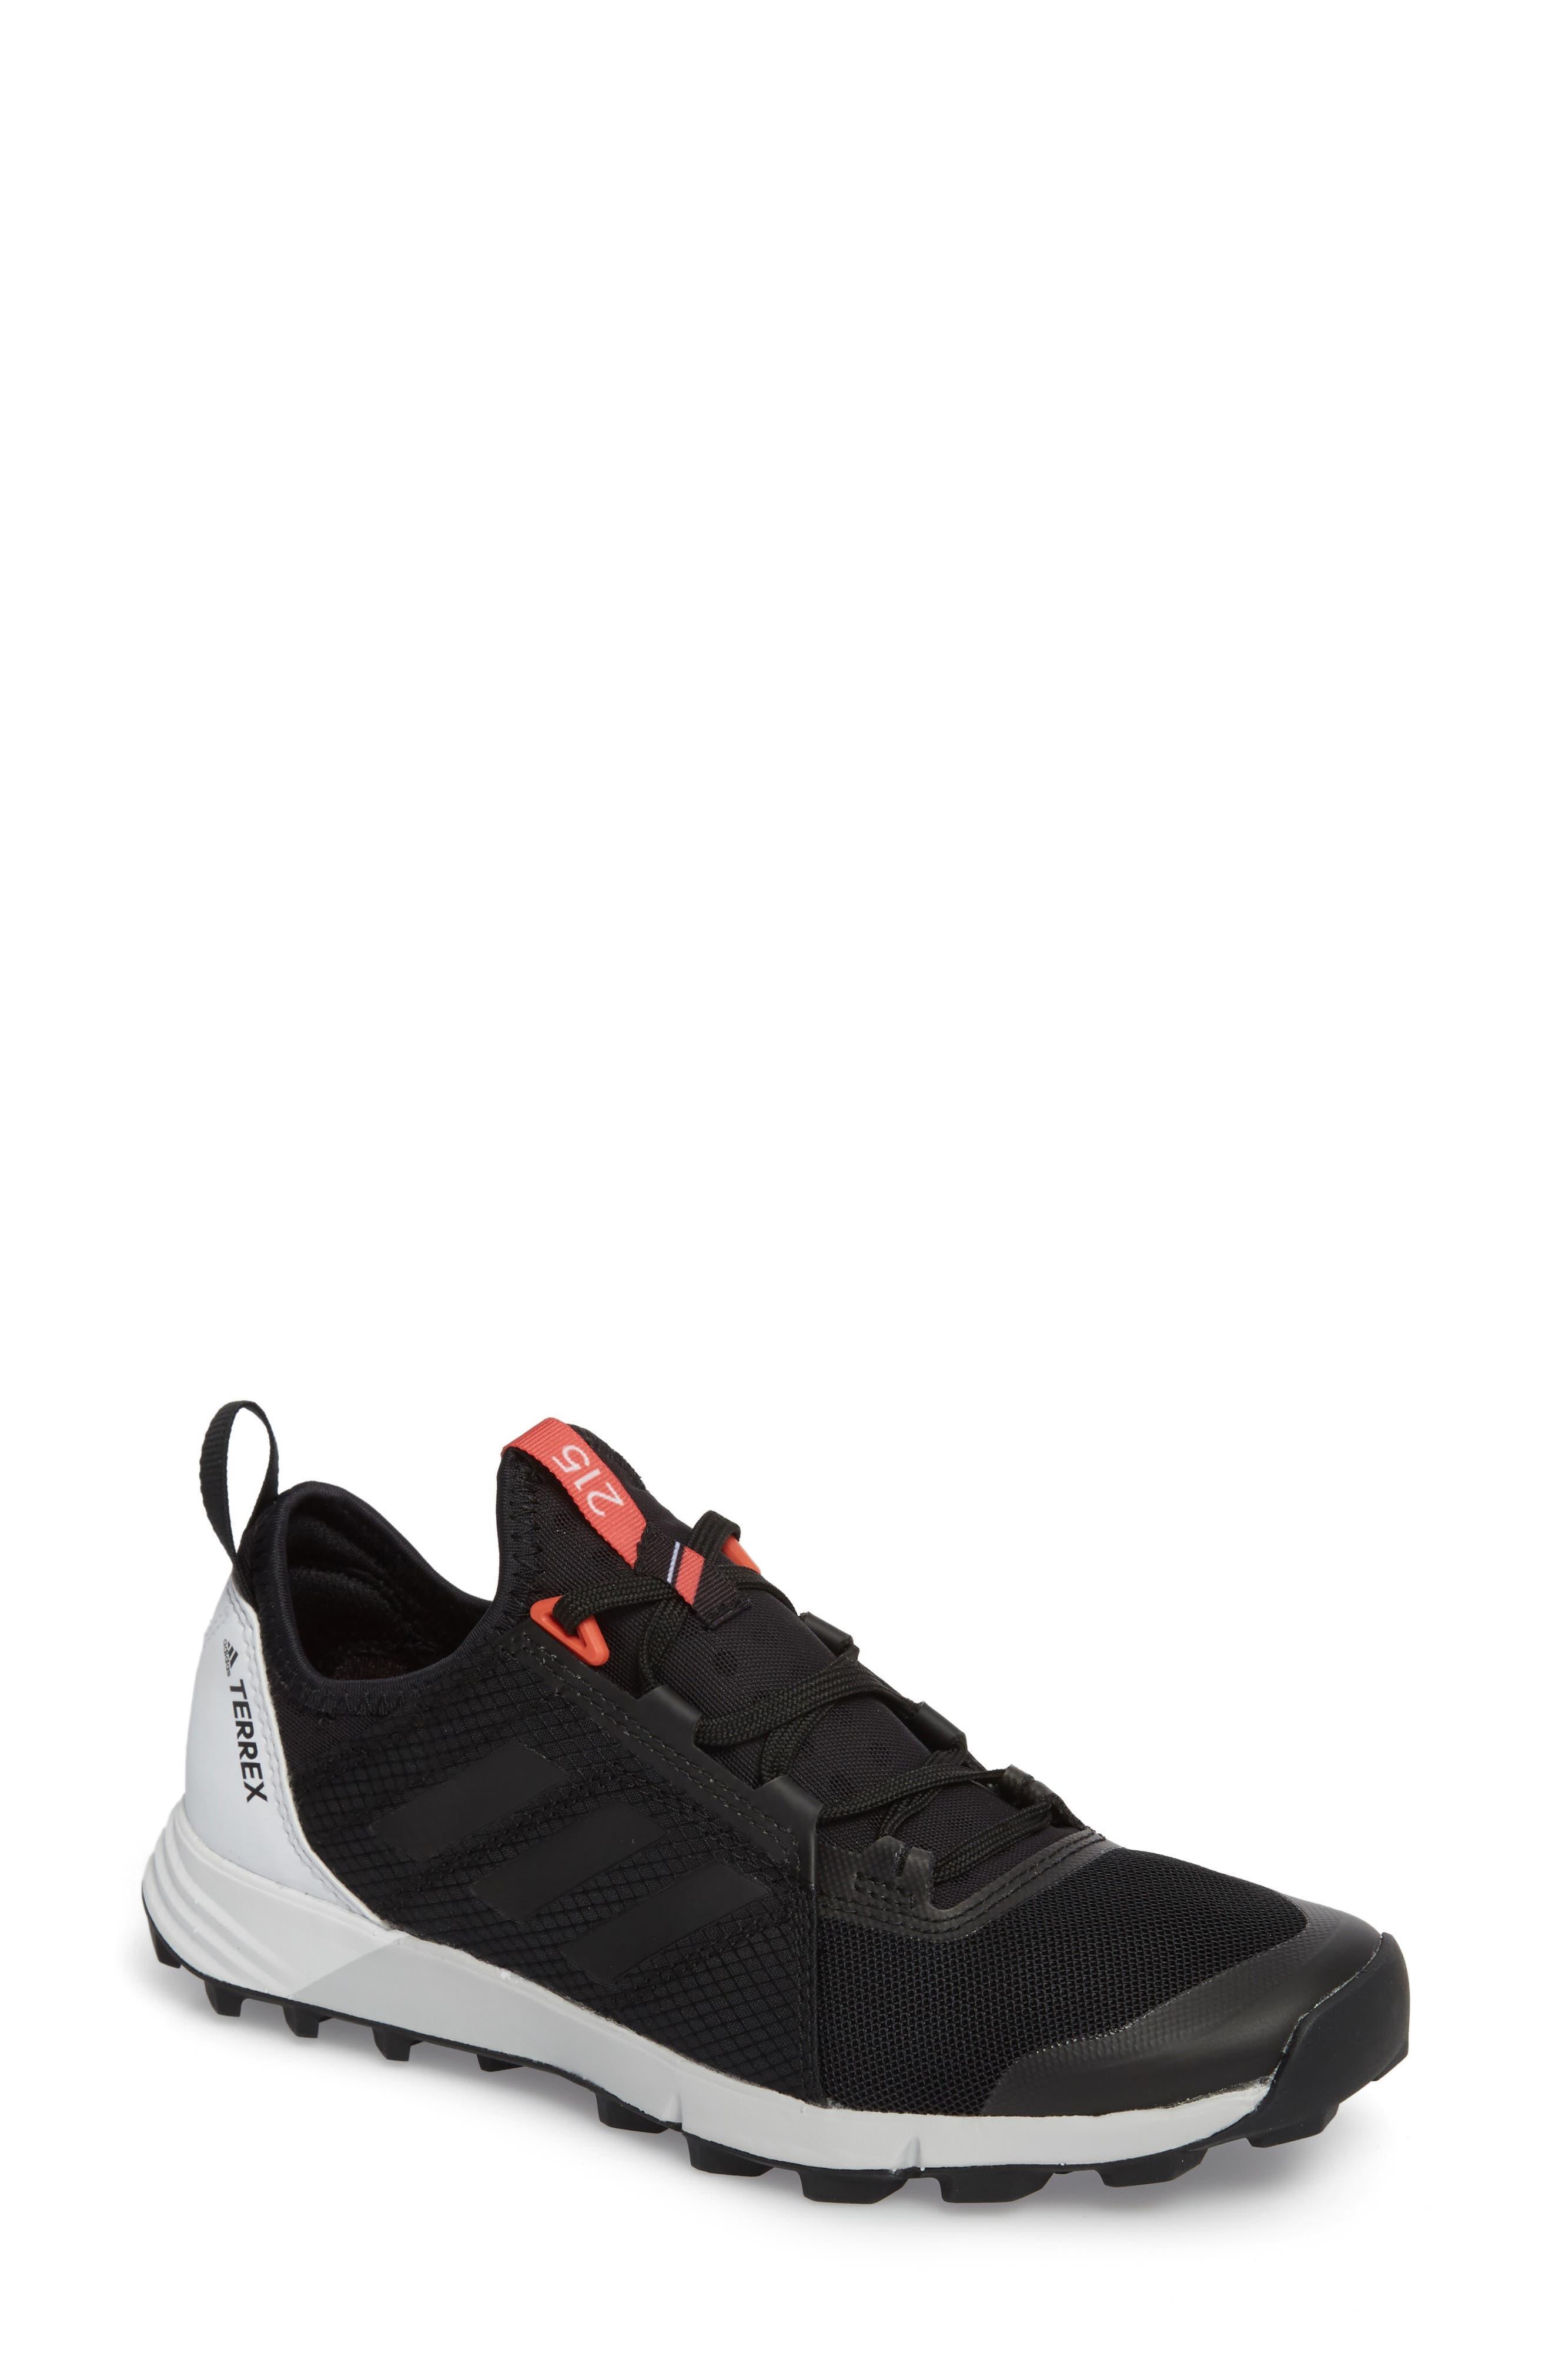 ADIDAS Terrex Agravic Speed Running Shoe, Main, color, BLACK/ WHITE